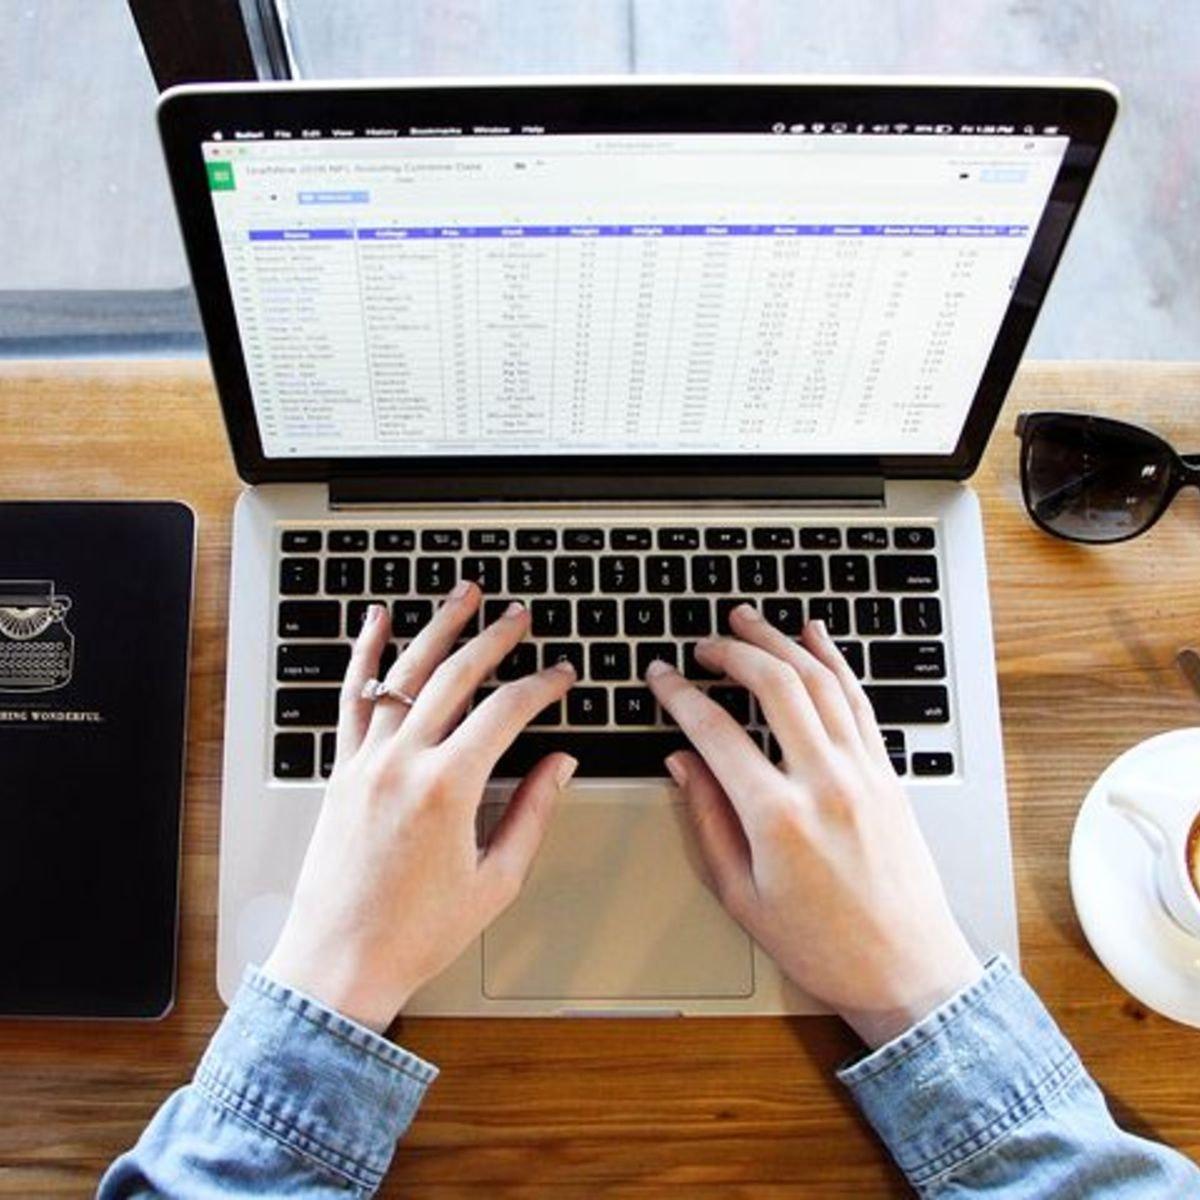 Excel/VBA for Creative Problem Solving, Part 1